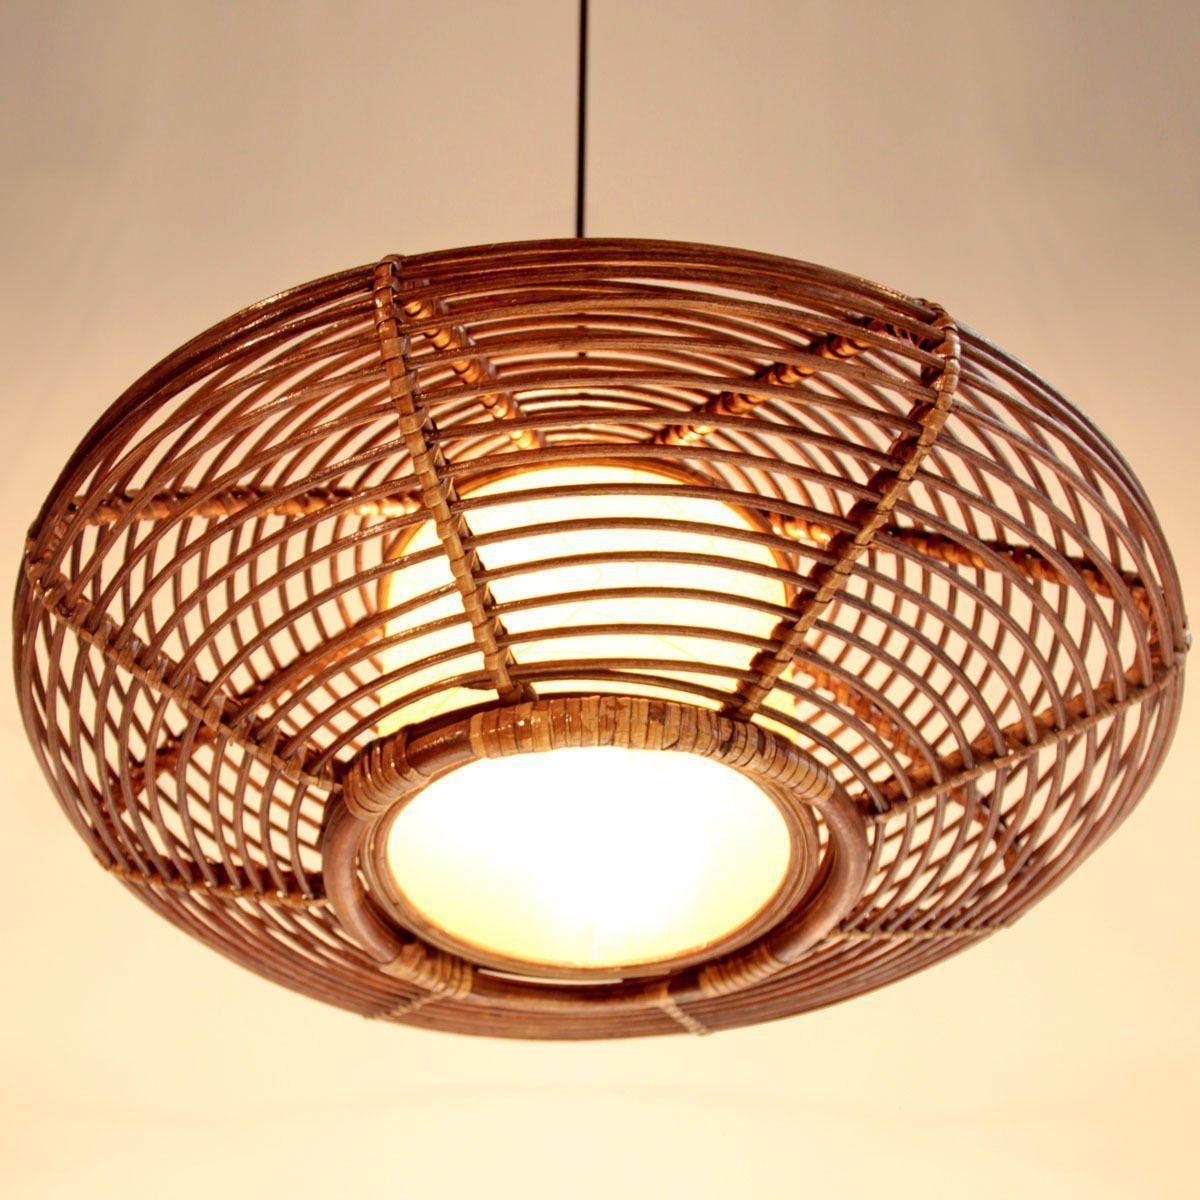 Nilight handmade modern rattan ceiling pendant lamp lighting nilight handmade modern rattan ceiling pendant lamp lighting fixture chandelier amazon aloadofball Image collections